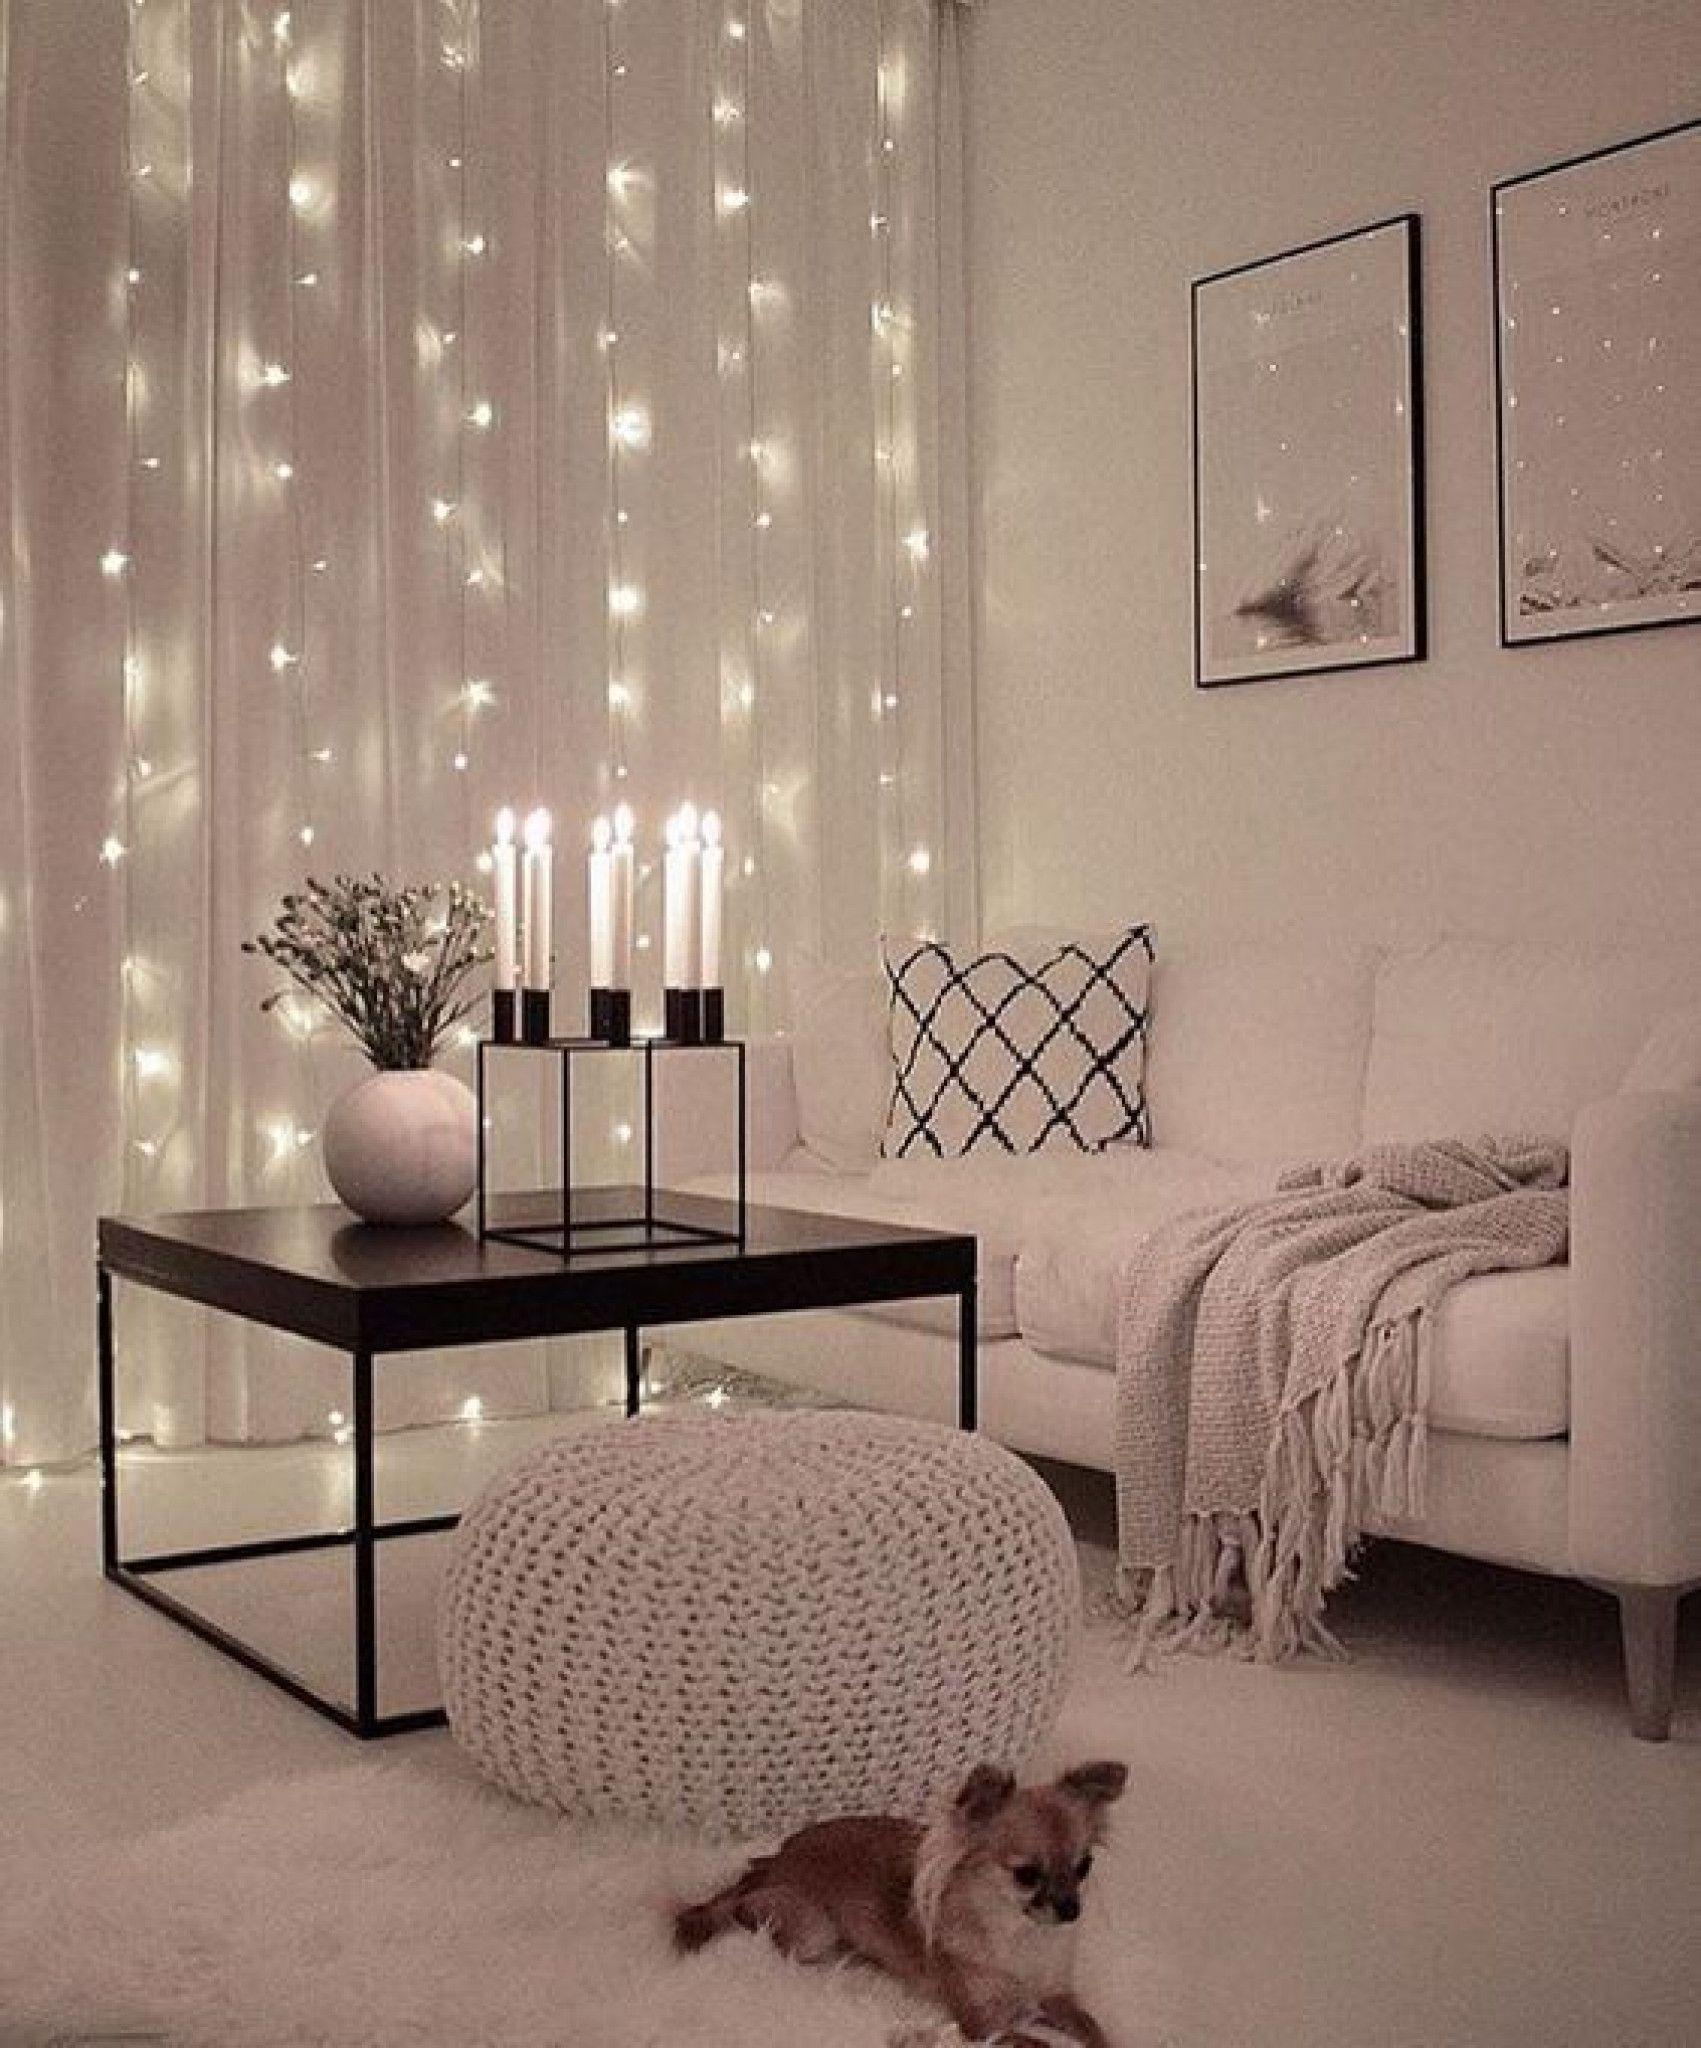 Home Decor Pinterest Best 25 Living Room Decorations Ideas On Diy